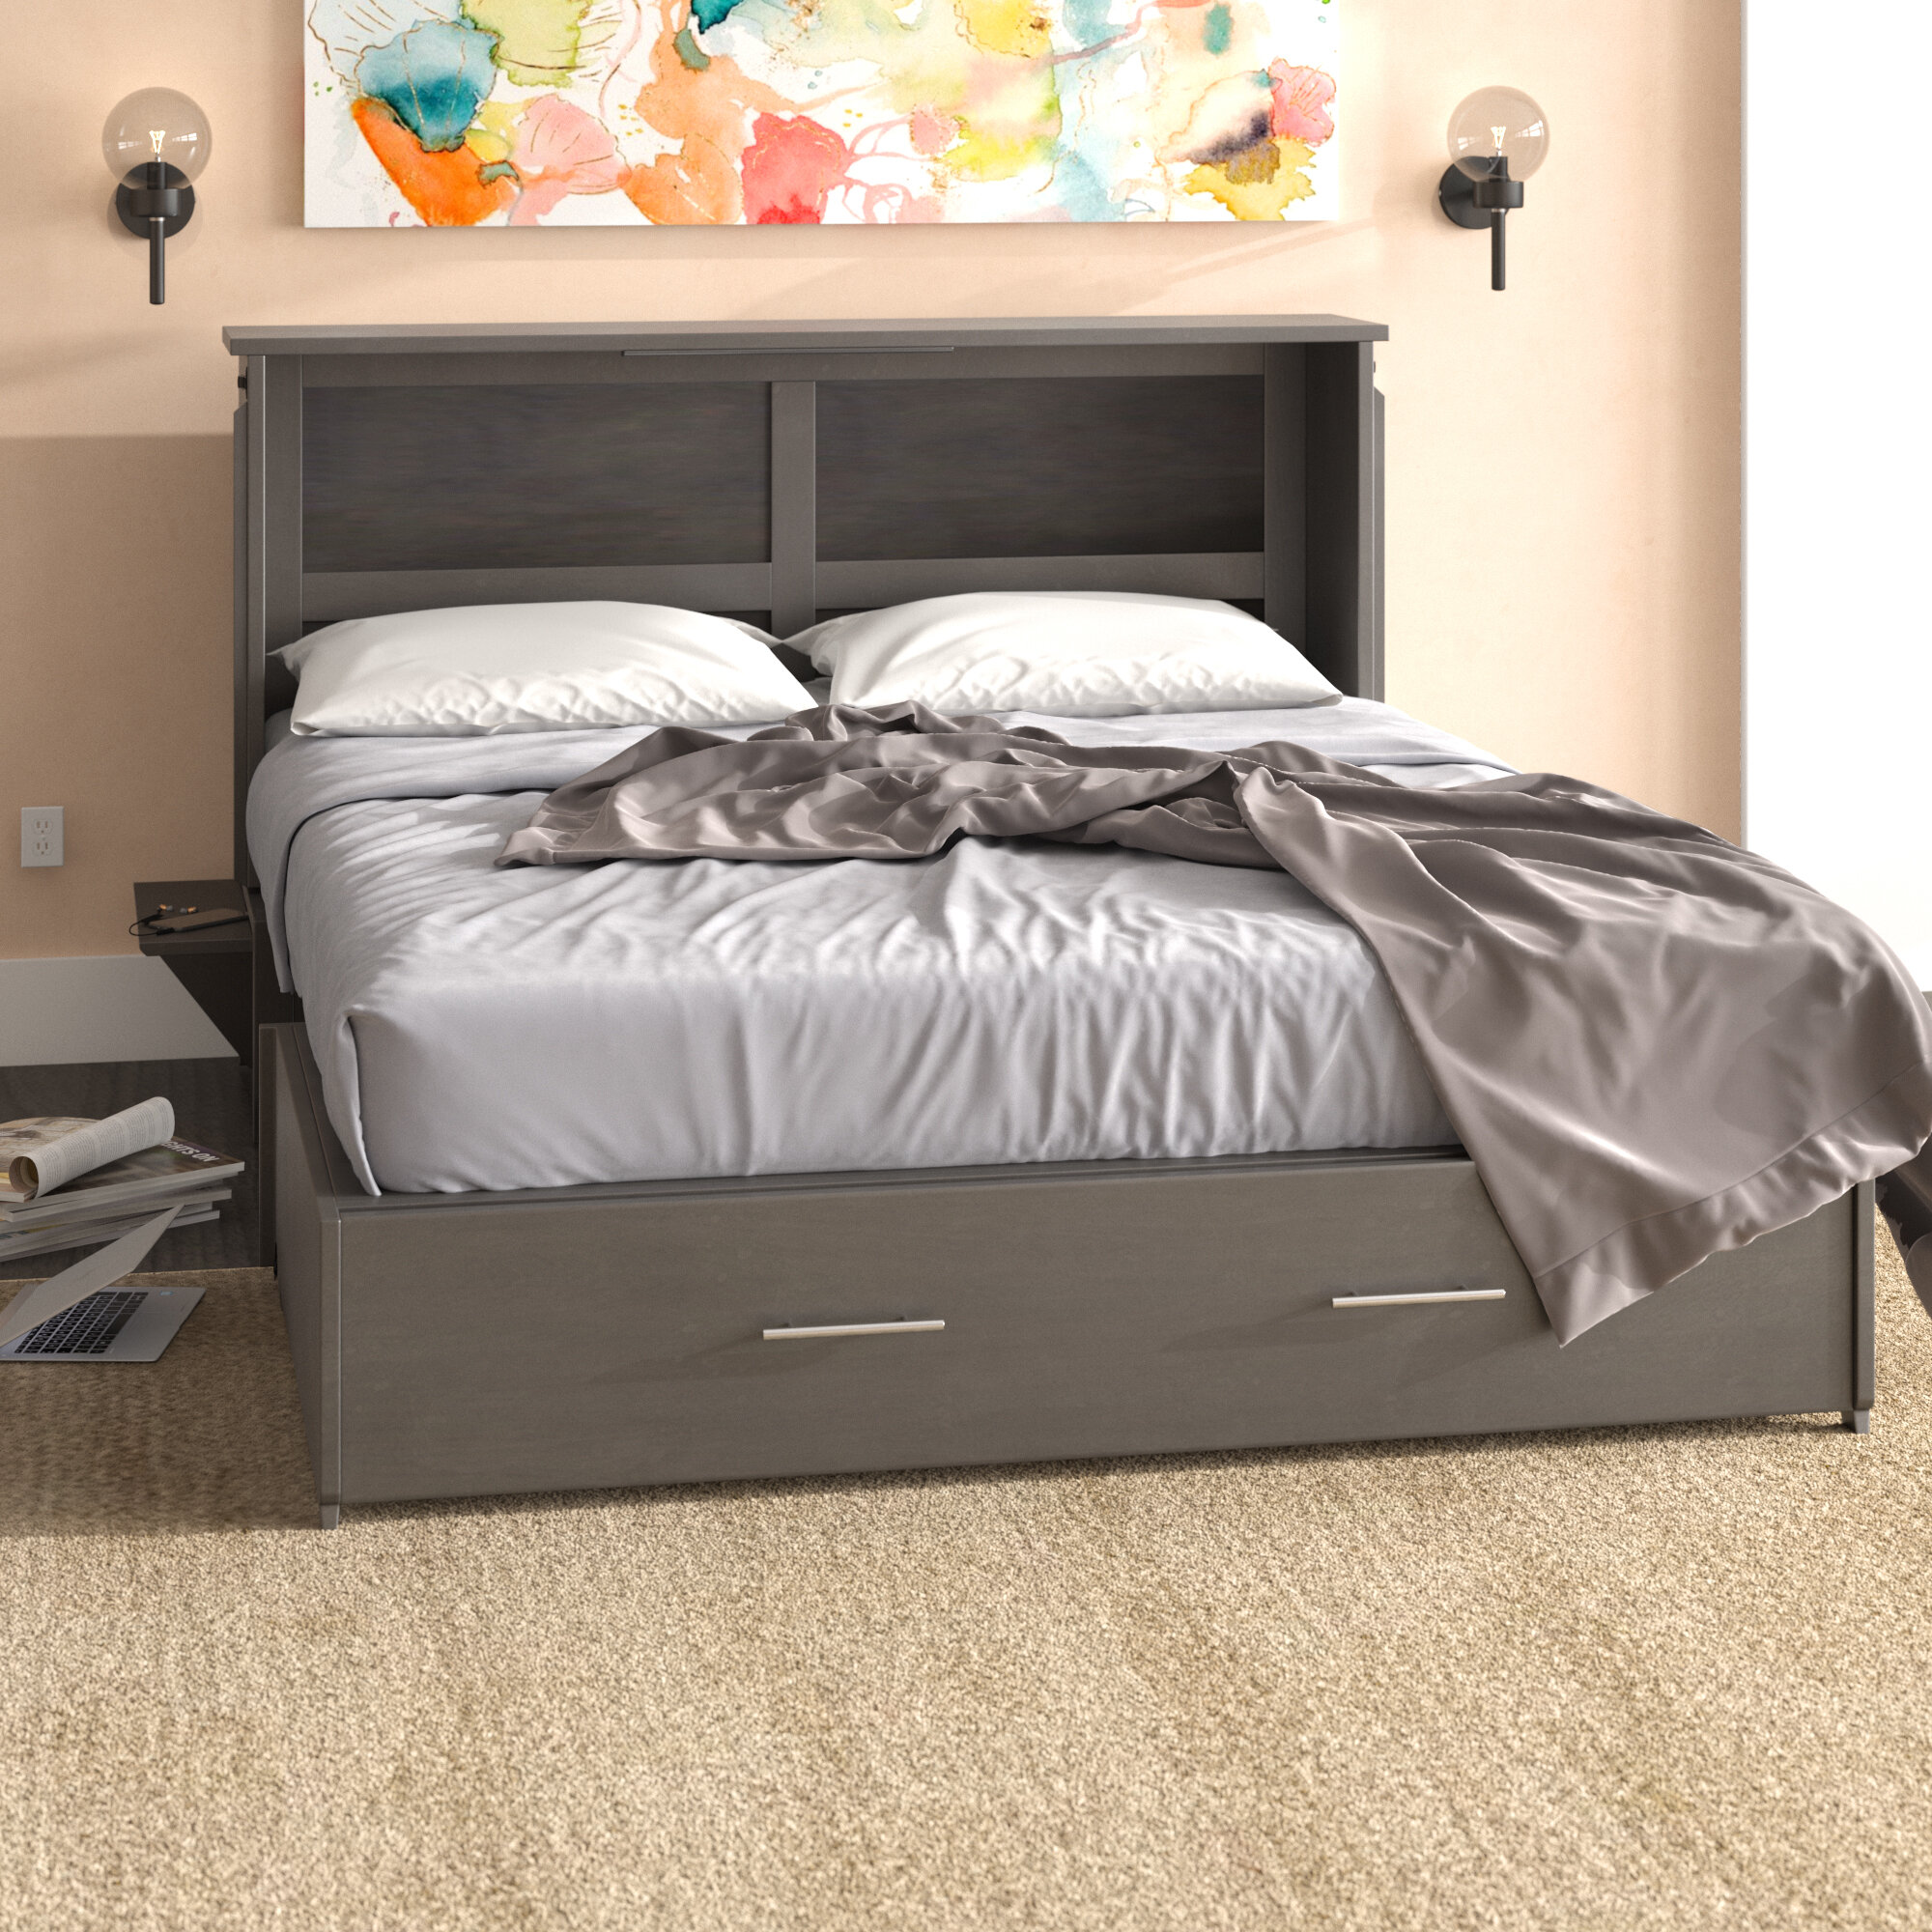 Queen Bed.Edmeston Queen Storage Murphy Bed With Mattress